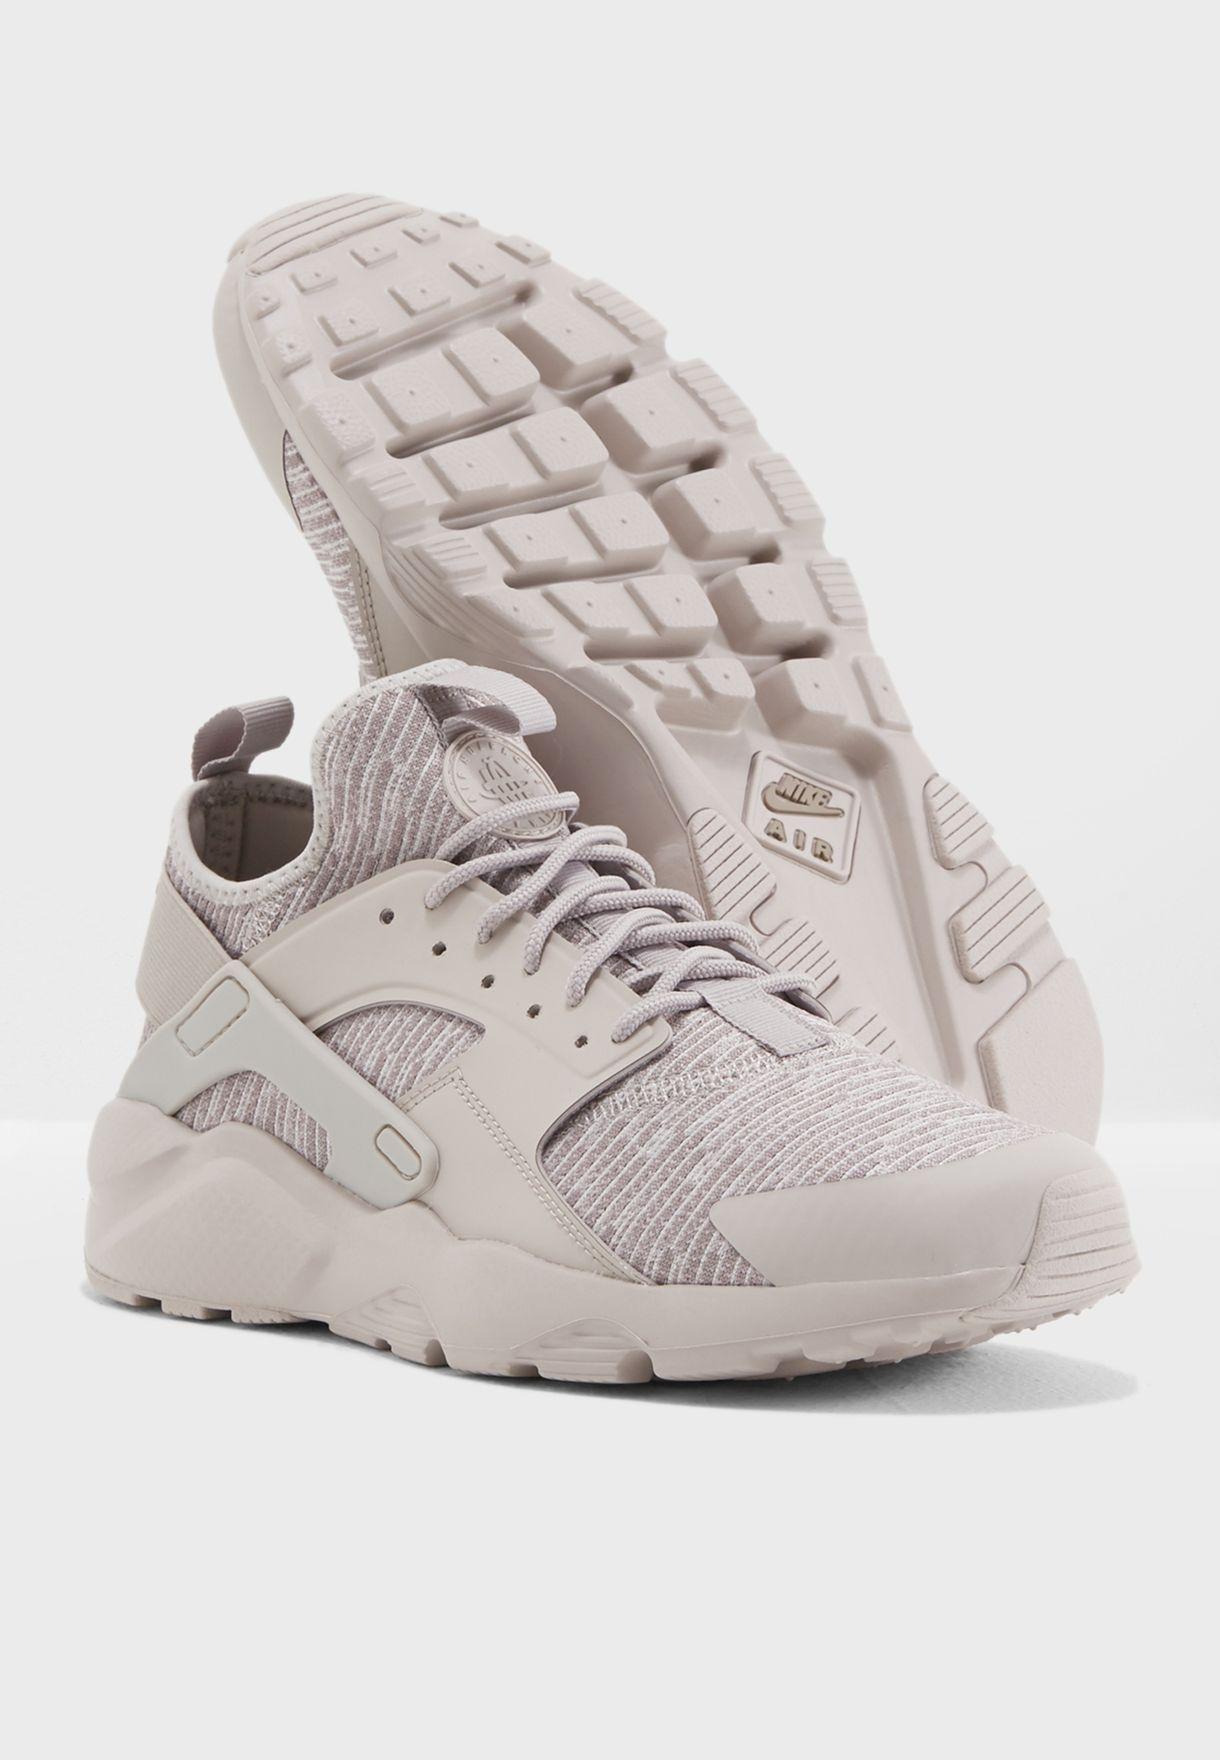 Nike Air Huarache Run Ul (875841 200)